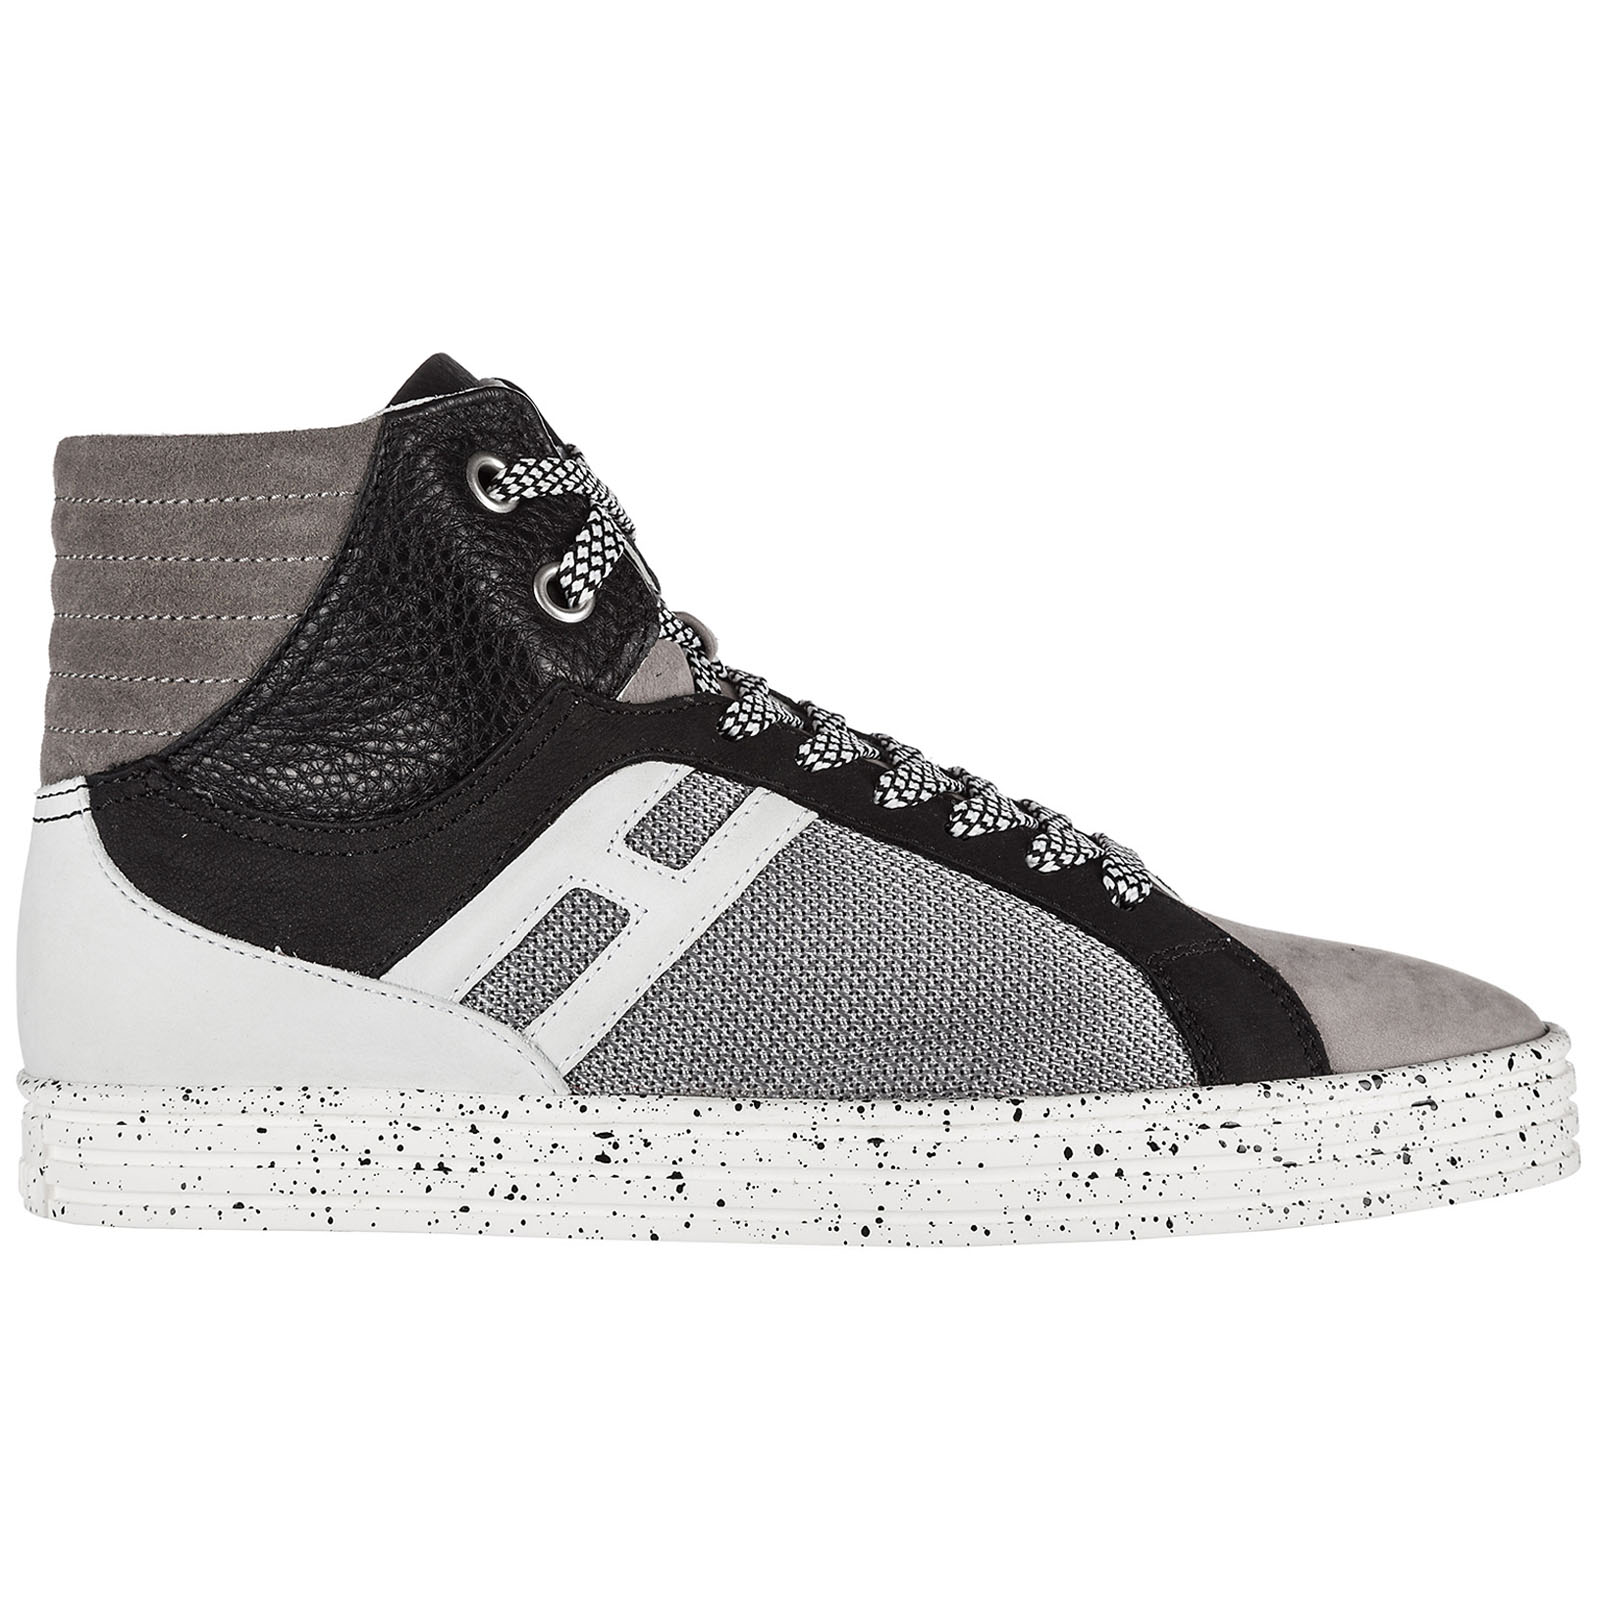 Scarpe sneakers alte uomo in camoscio rebel r141 basket